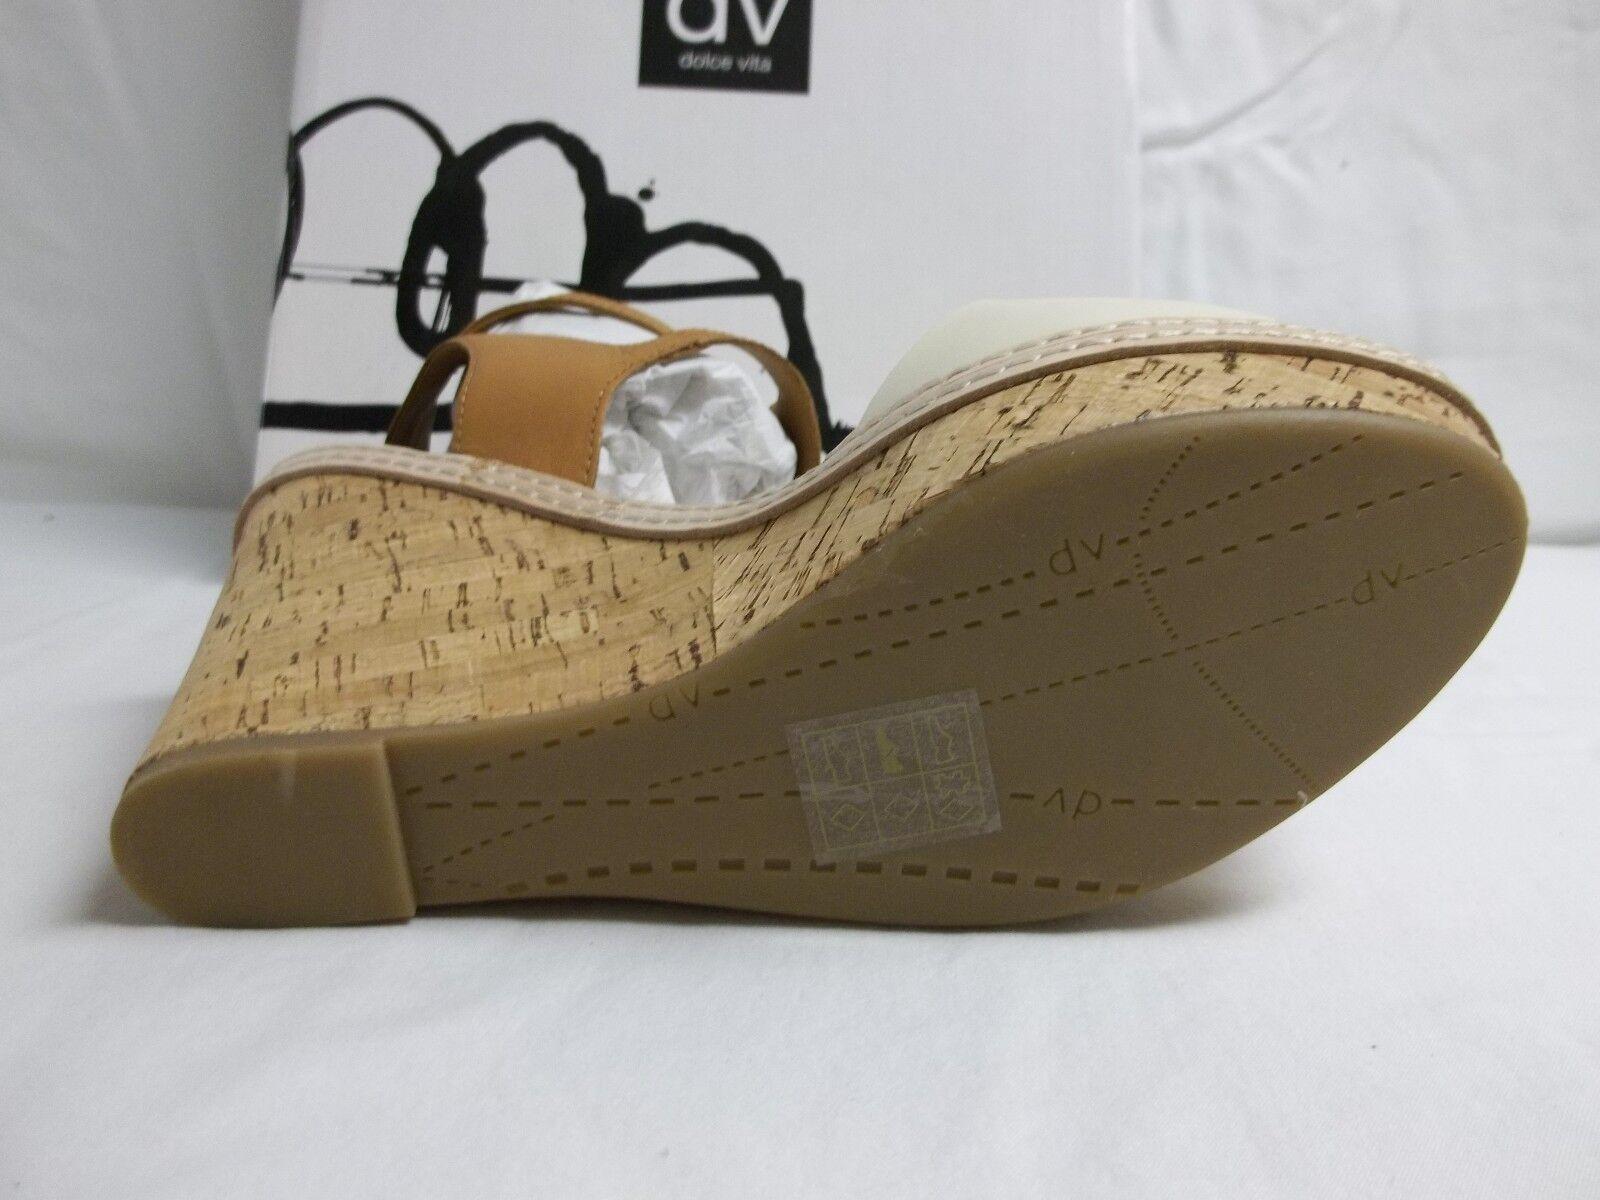 Dolce Vita Größe 10 M Jesper Bone Leder Damenschuhe Open Toe Wedges New Damenschuhe Leder Schuhes 0c992a